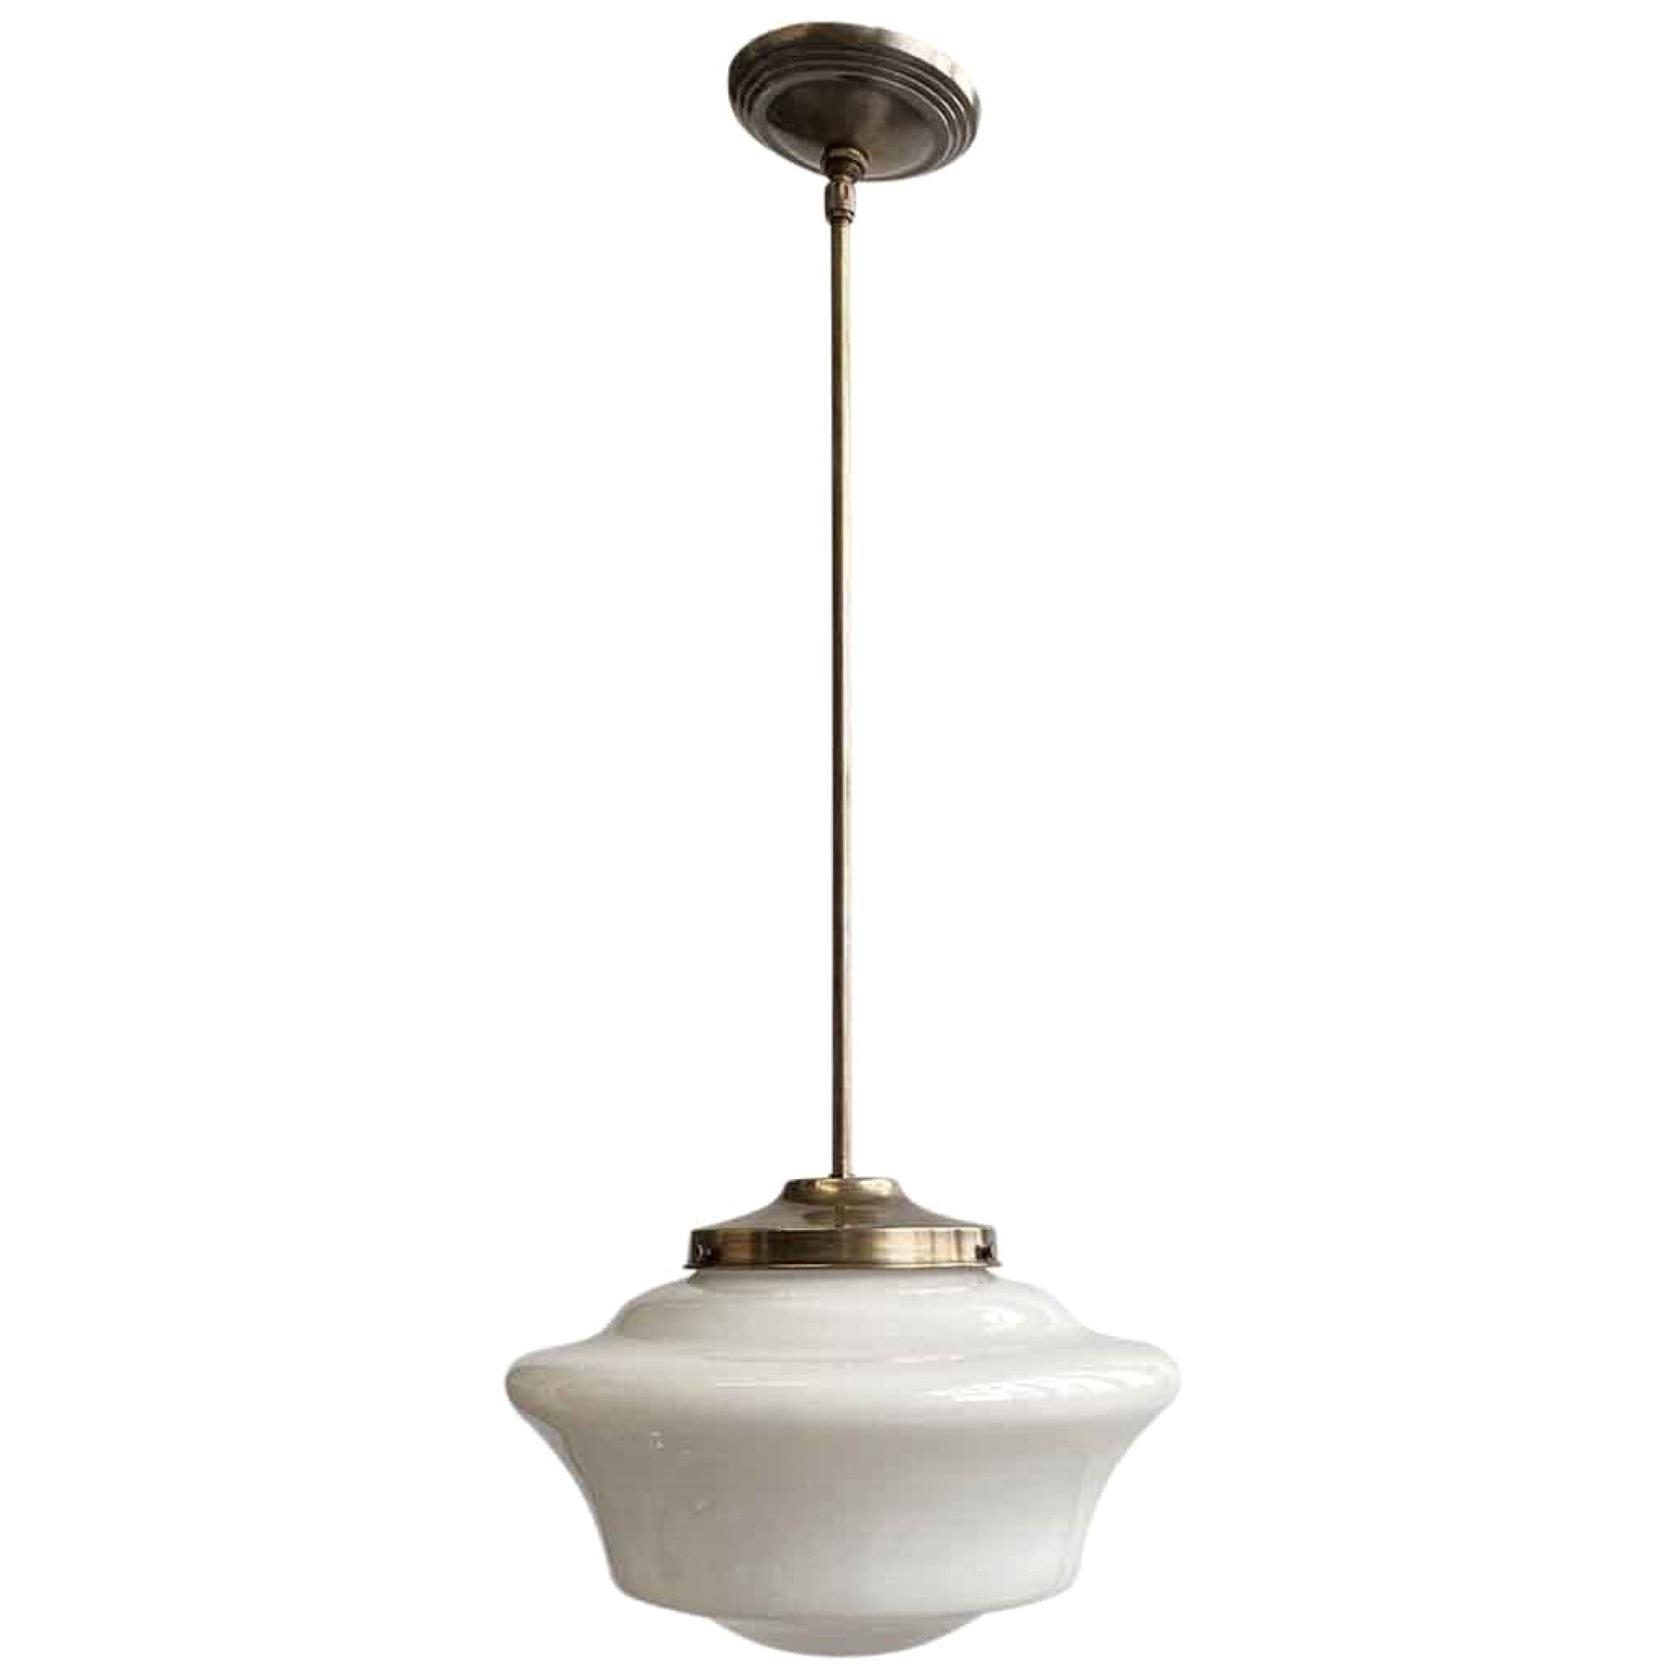 1920s Pendant Light Schoolhouse White Milk Glass Globe with Brass Hardware